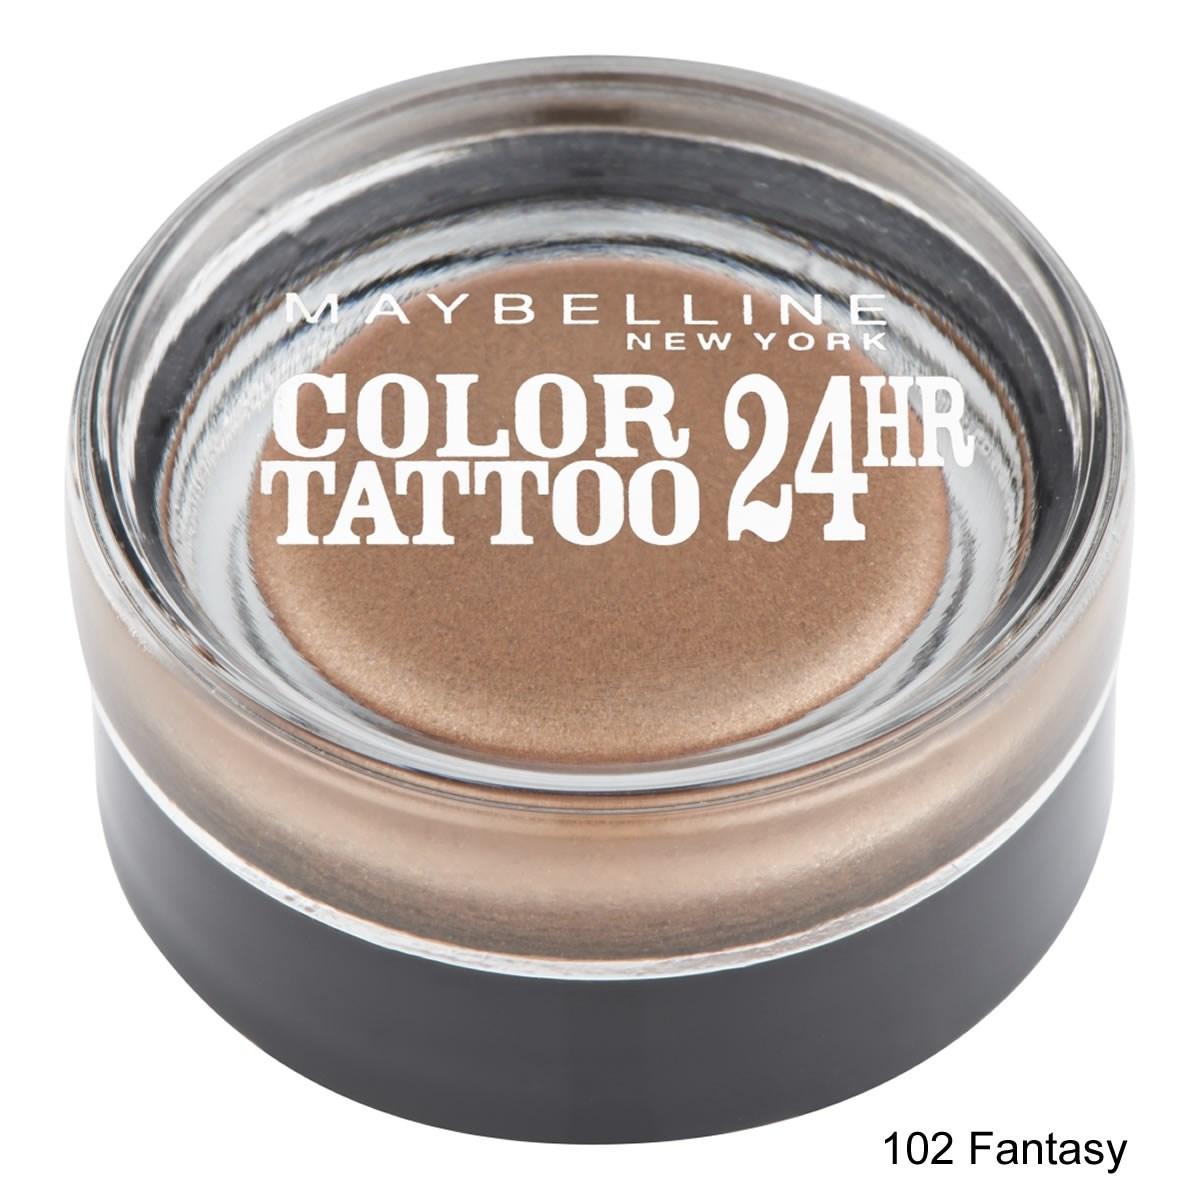 eChemist.co.uk | Maybelline Color Tattoo 24Hr Gel-Cream Eyeshadow